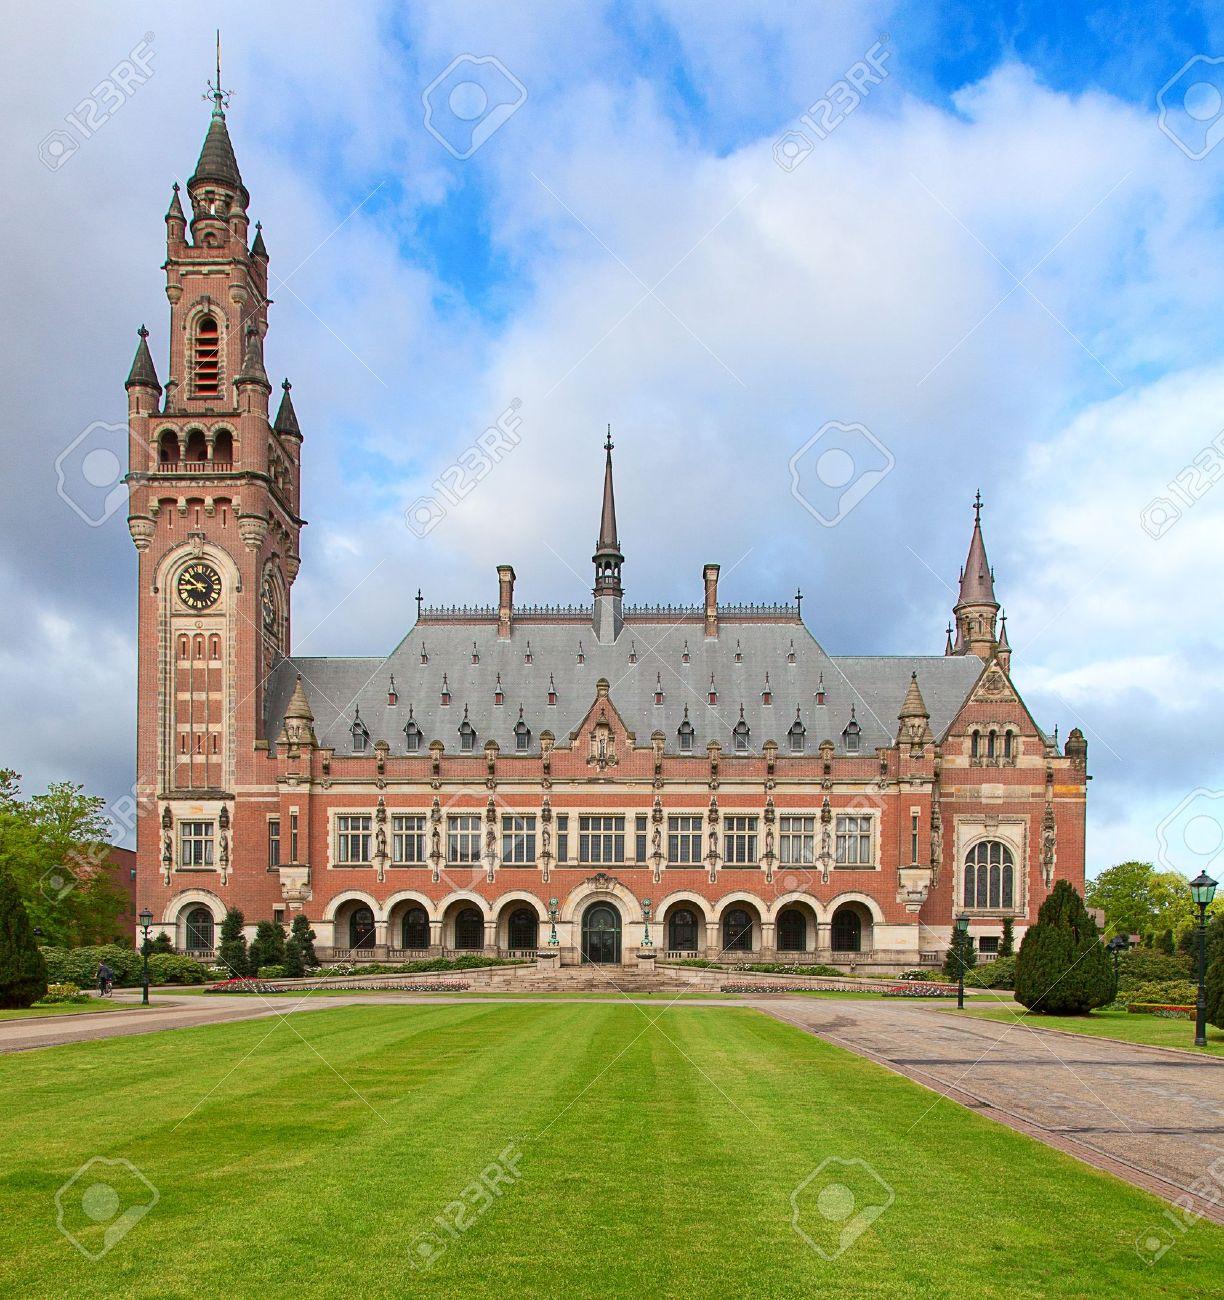 International court of justice in Hague, Netherlands - 19847756